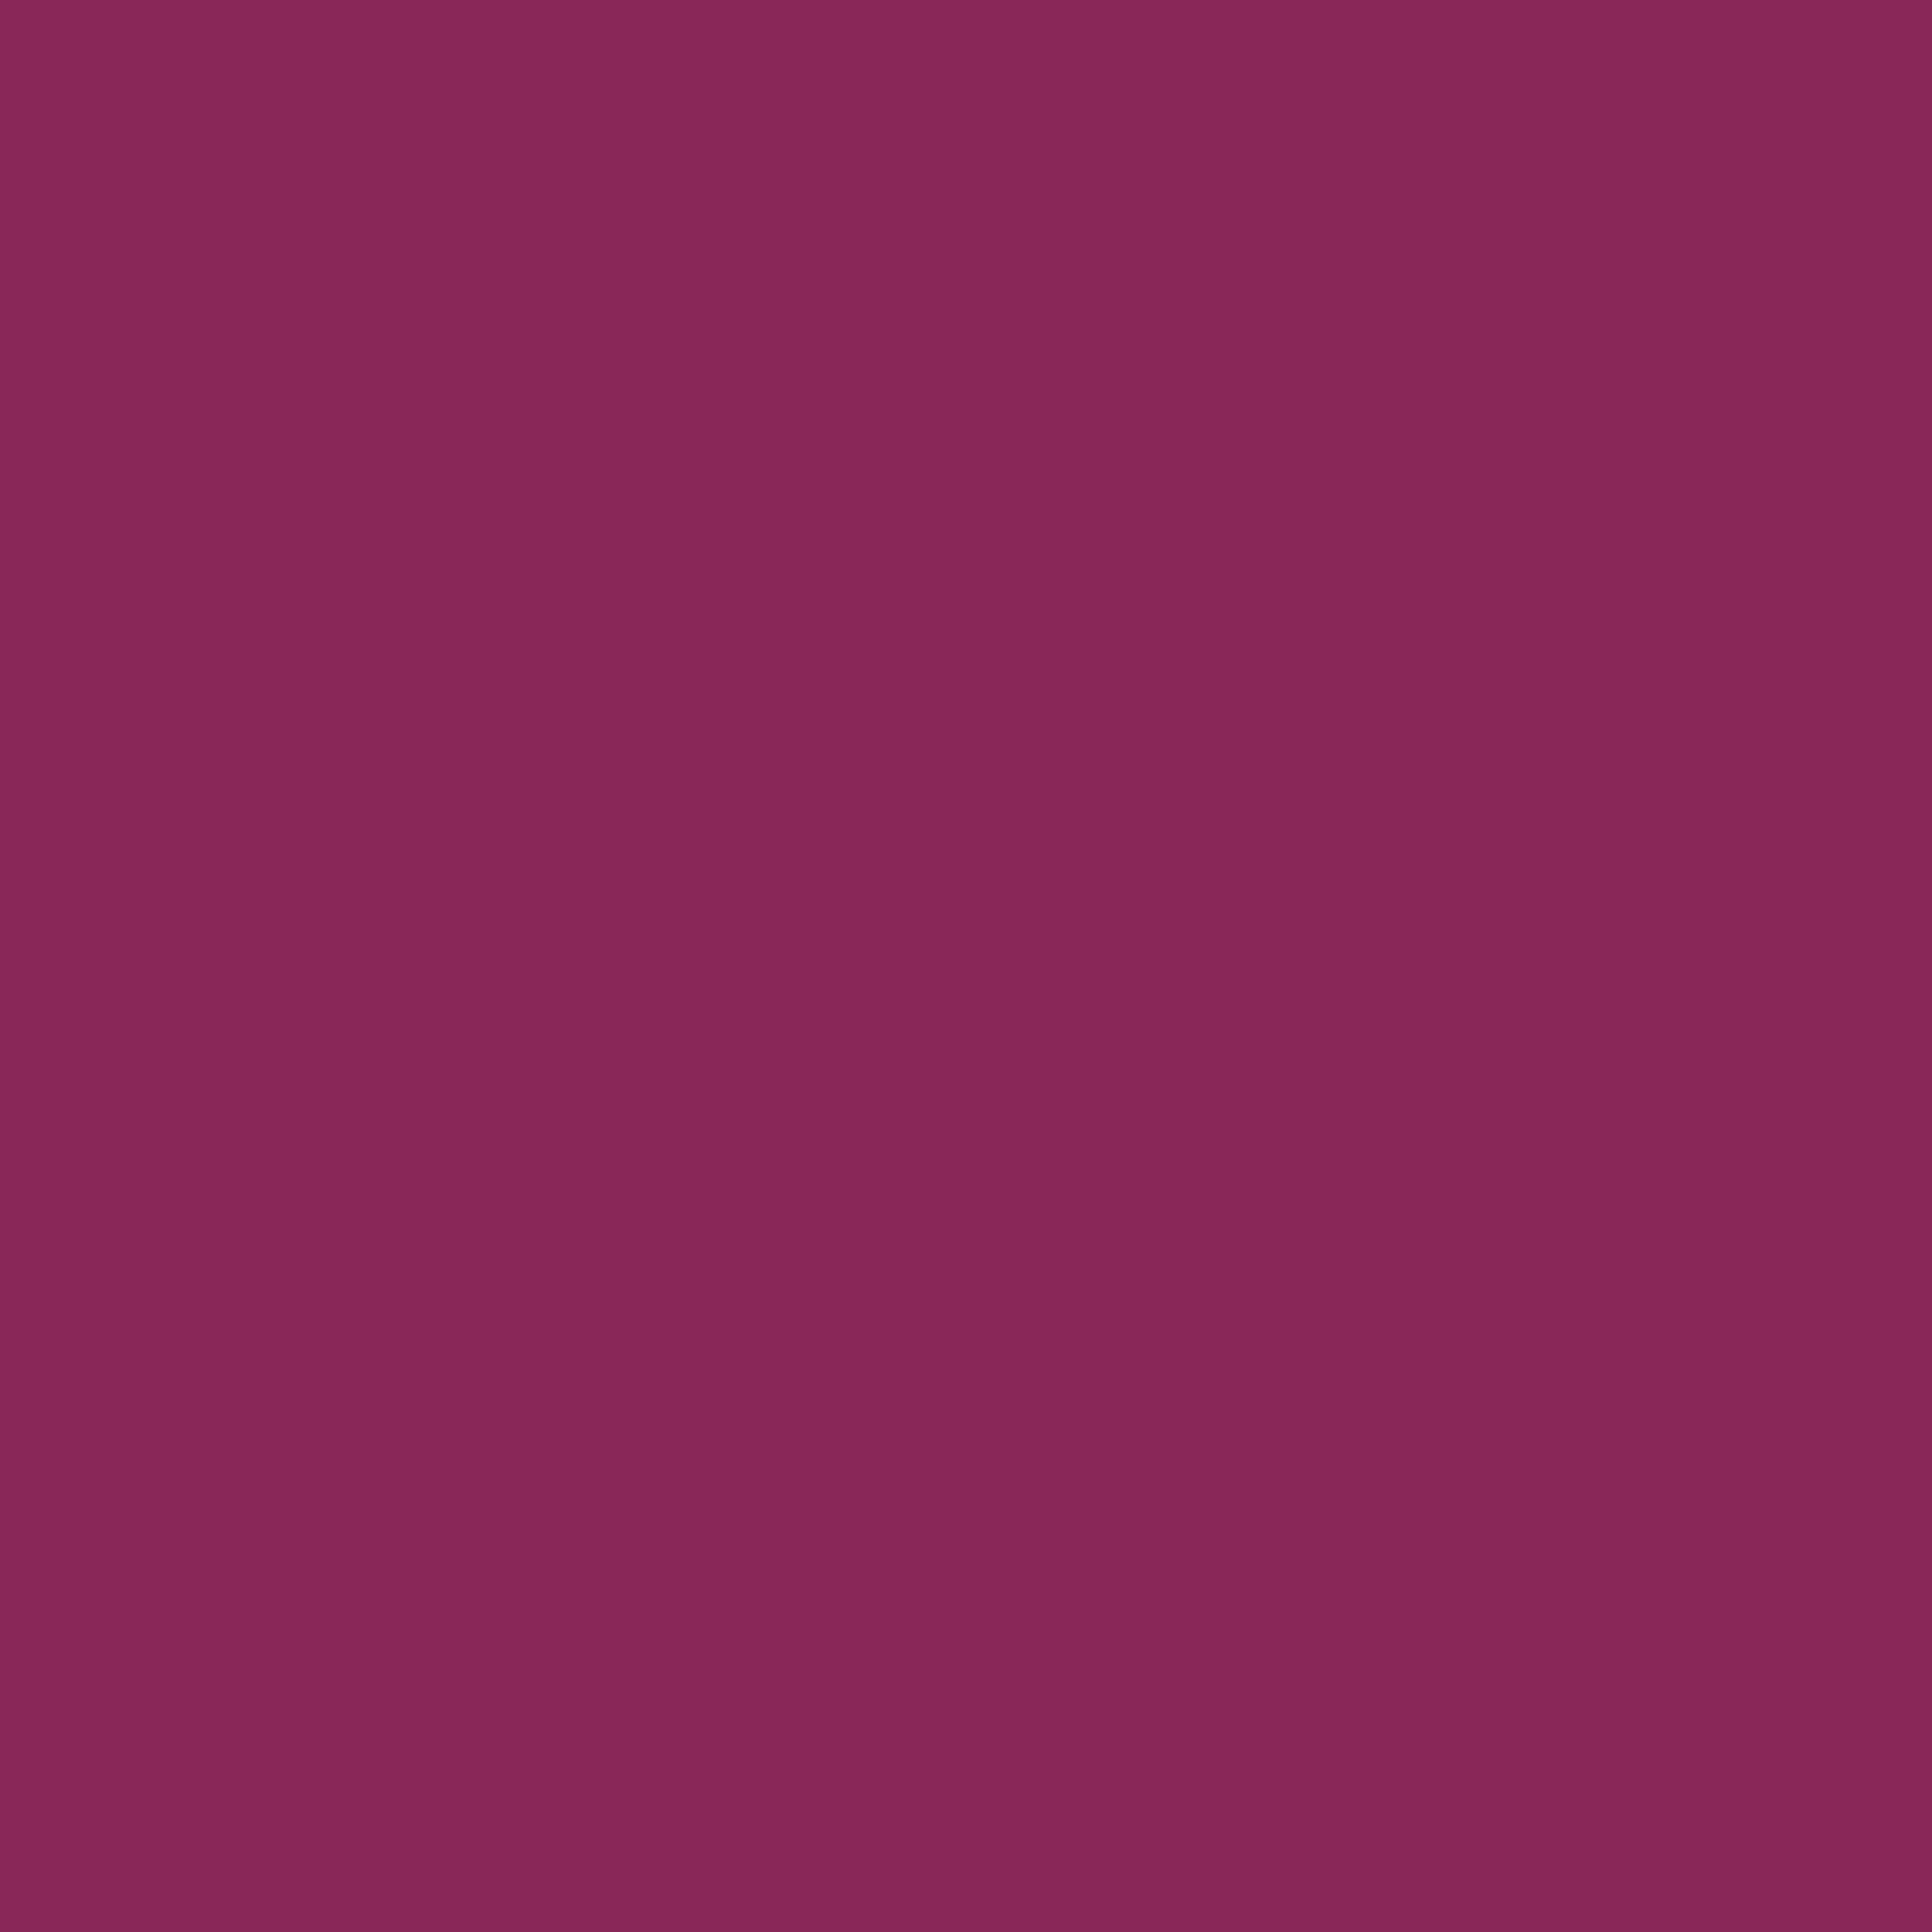 3600x3600 Dark Raspberry Solid Color Background